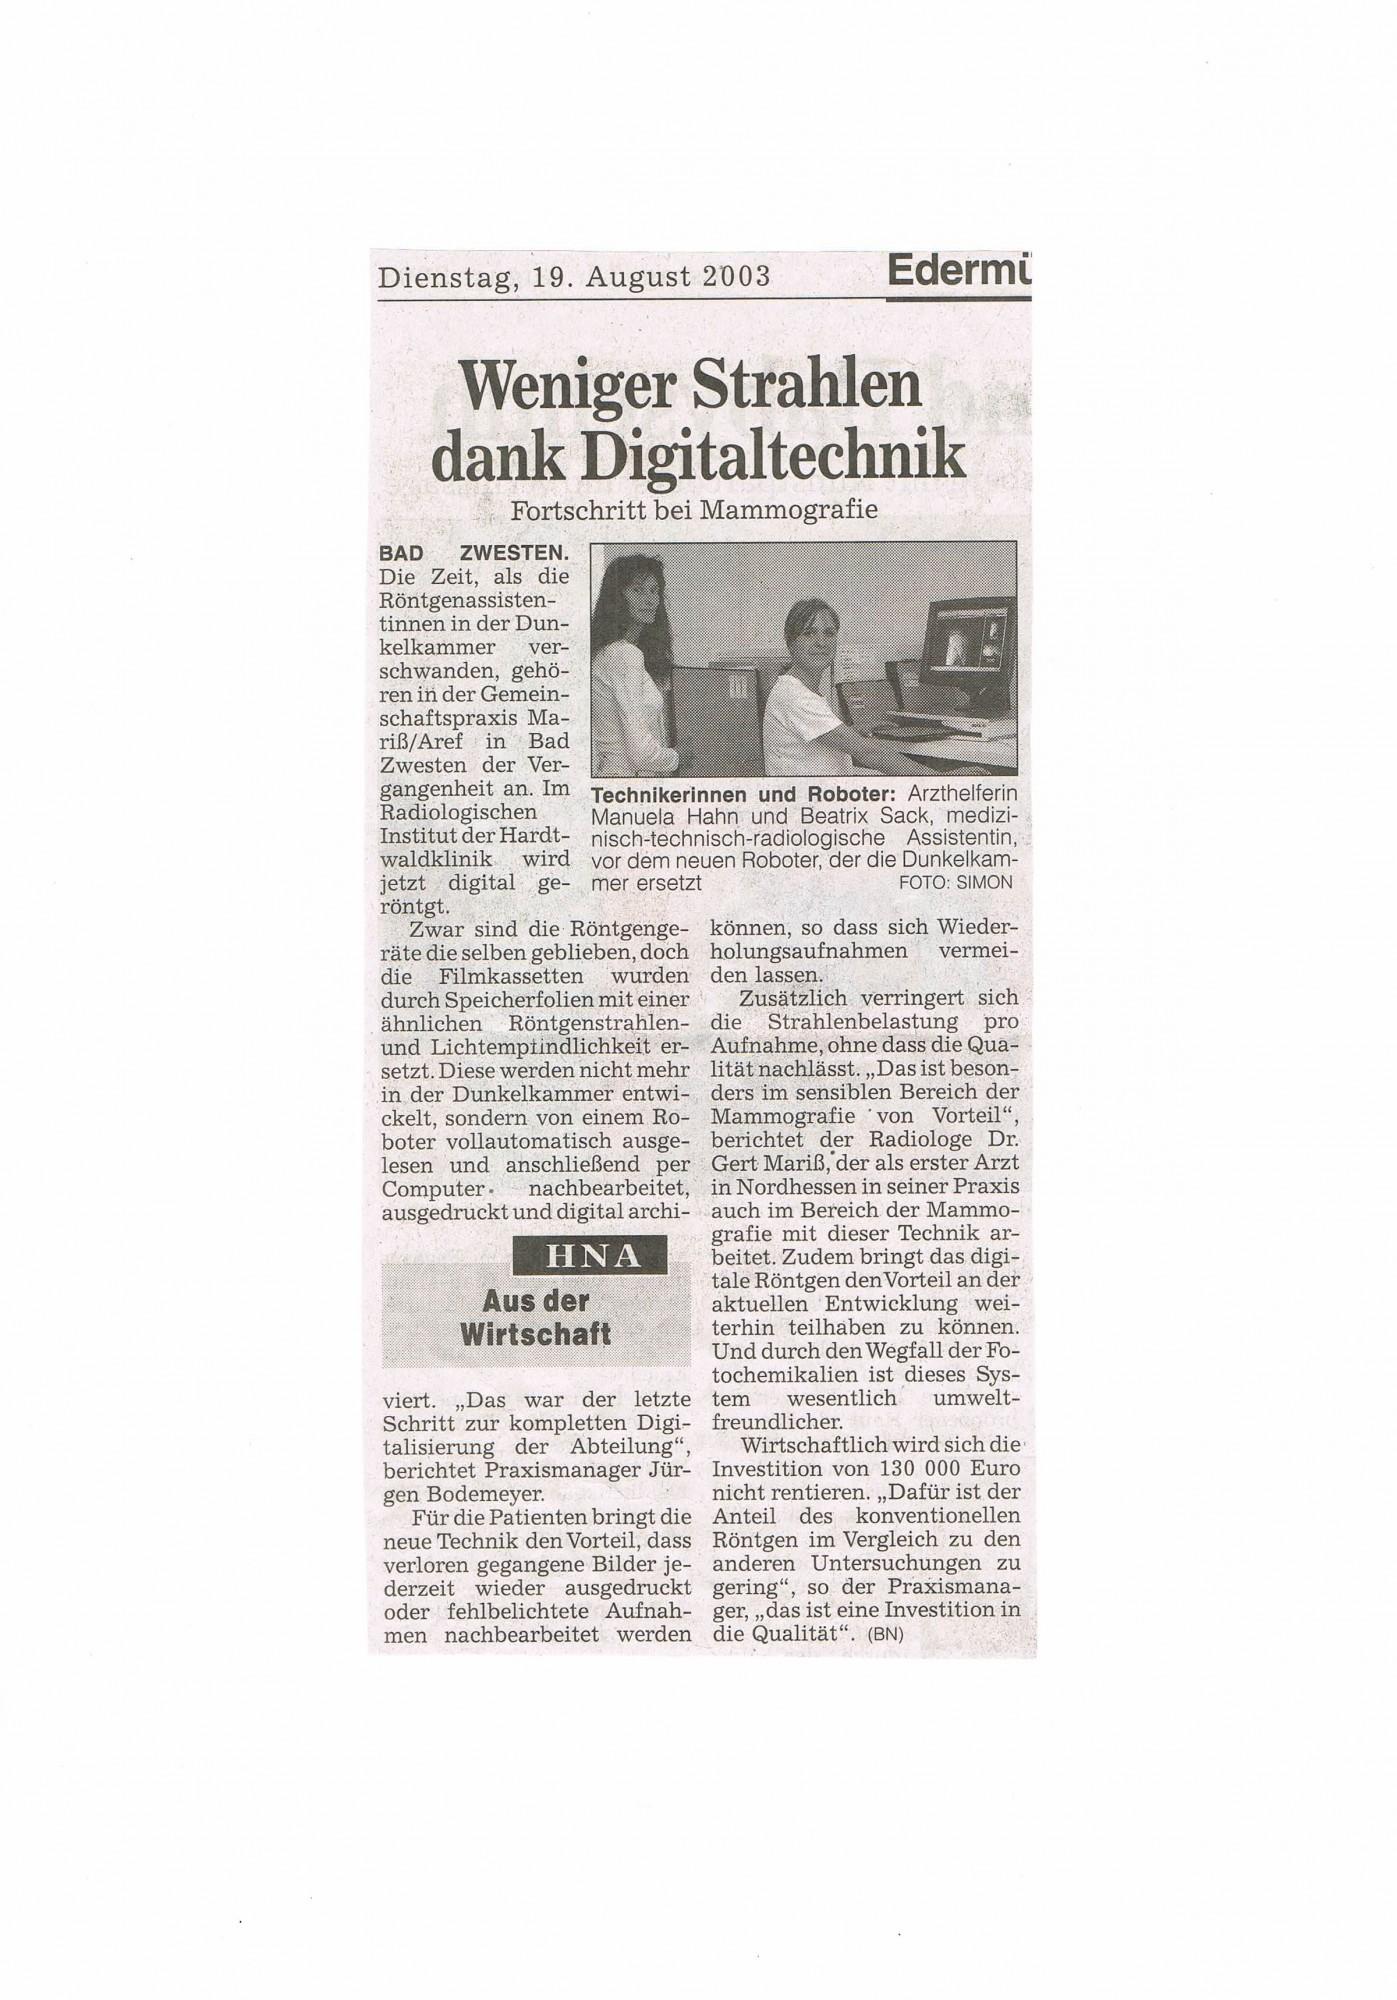 2003-08-19 Weniger Strahlen dank Digitaltechnik-001